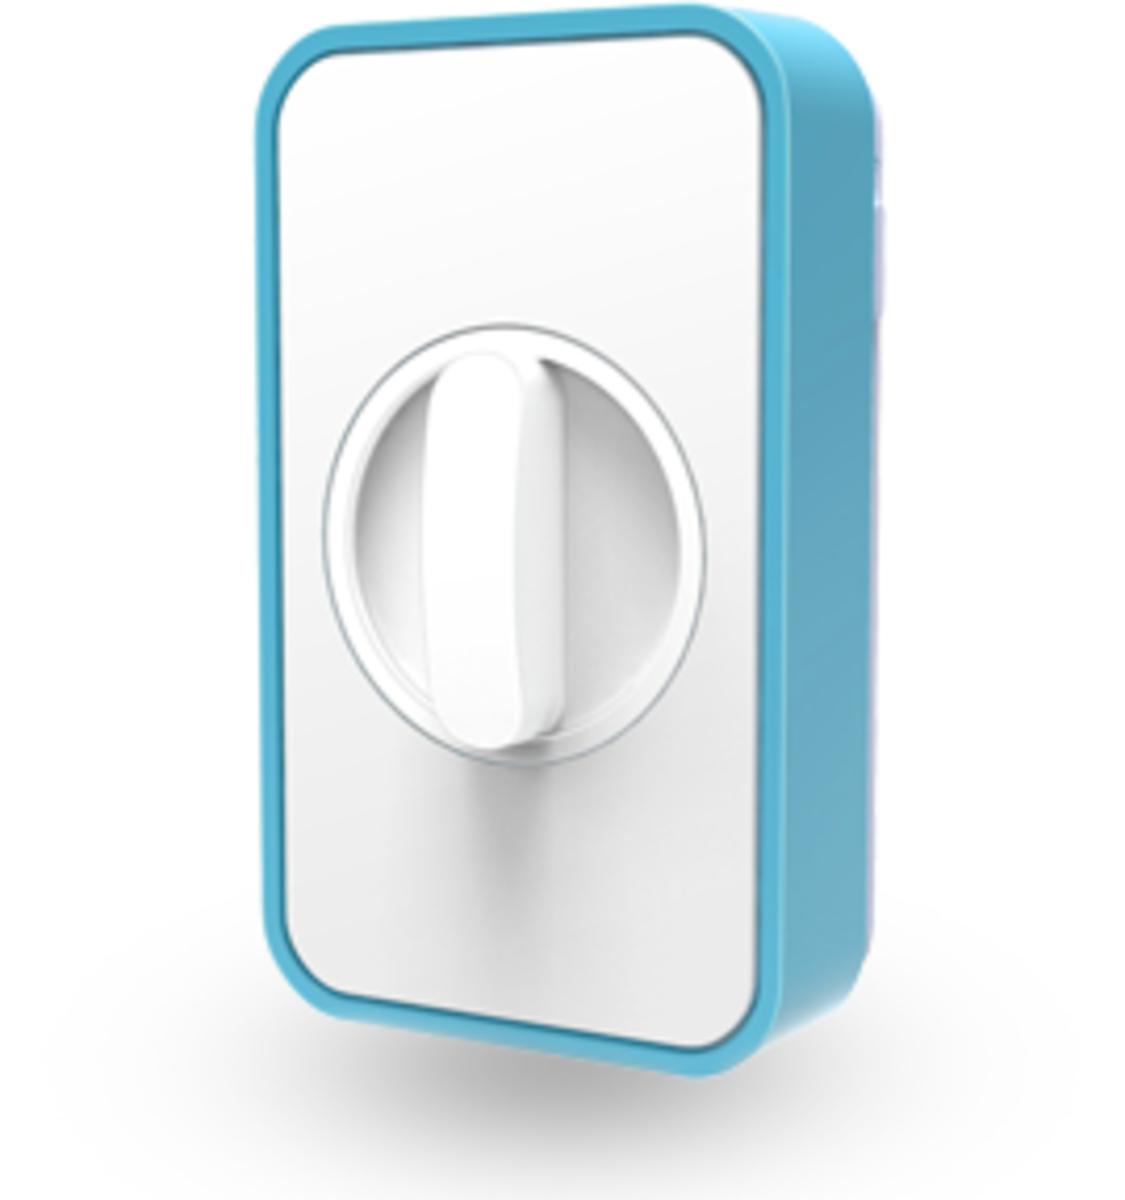 iphone-controlled-door-locks-3-amazing-smartphone-deadbolts-coming-your-way-soon